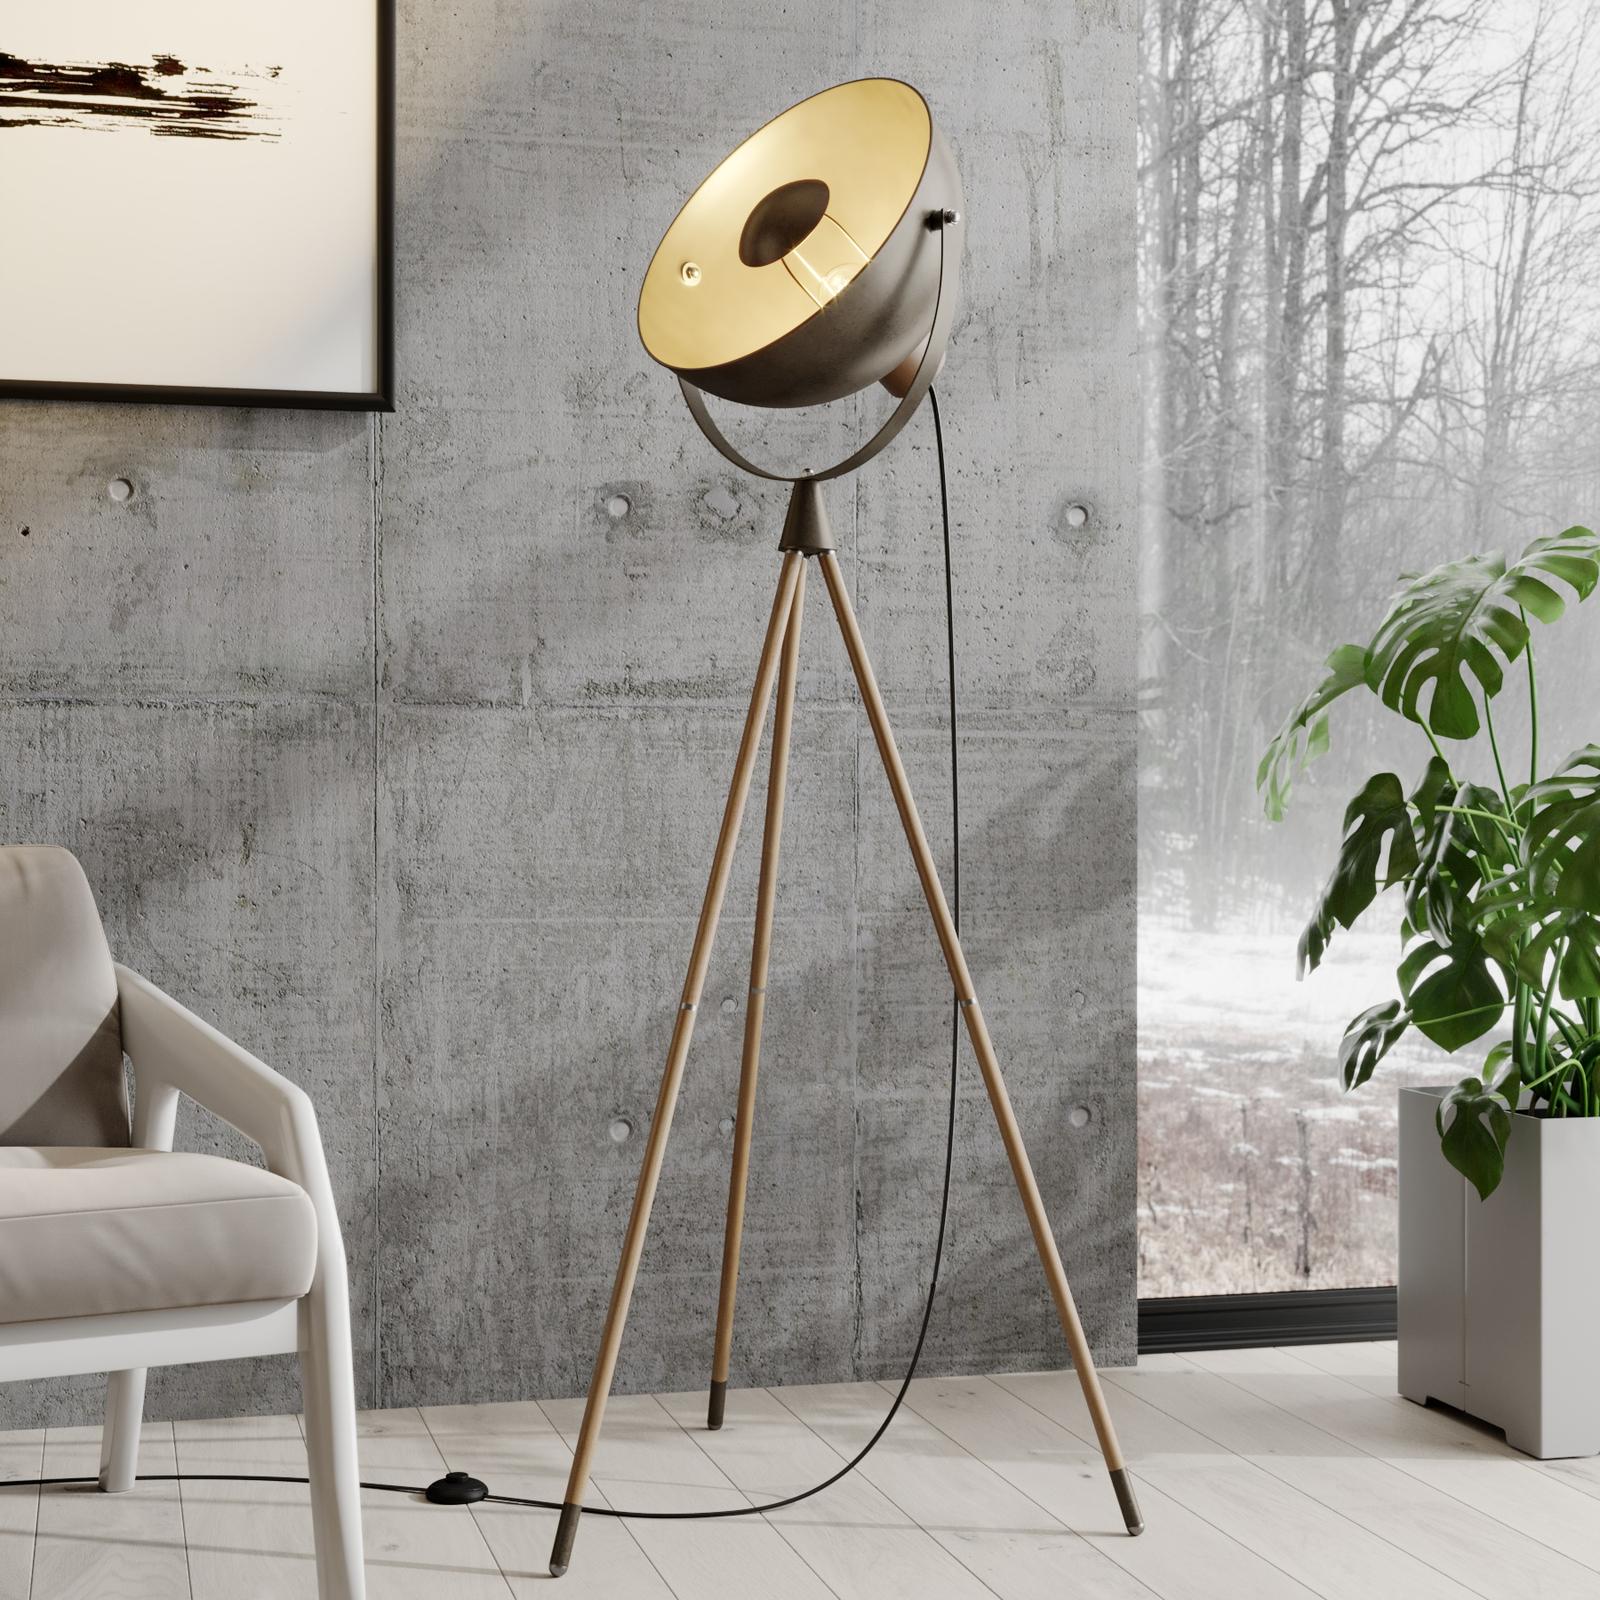 Lindby Scharlie vloerlamp met metalen kap